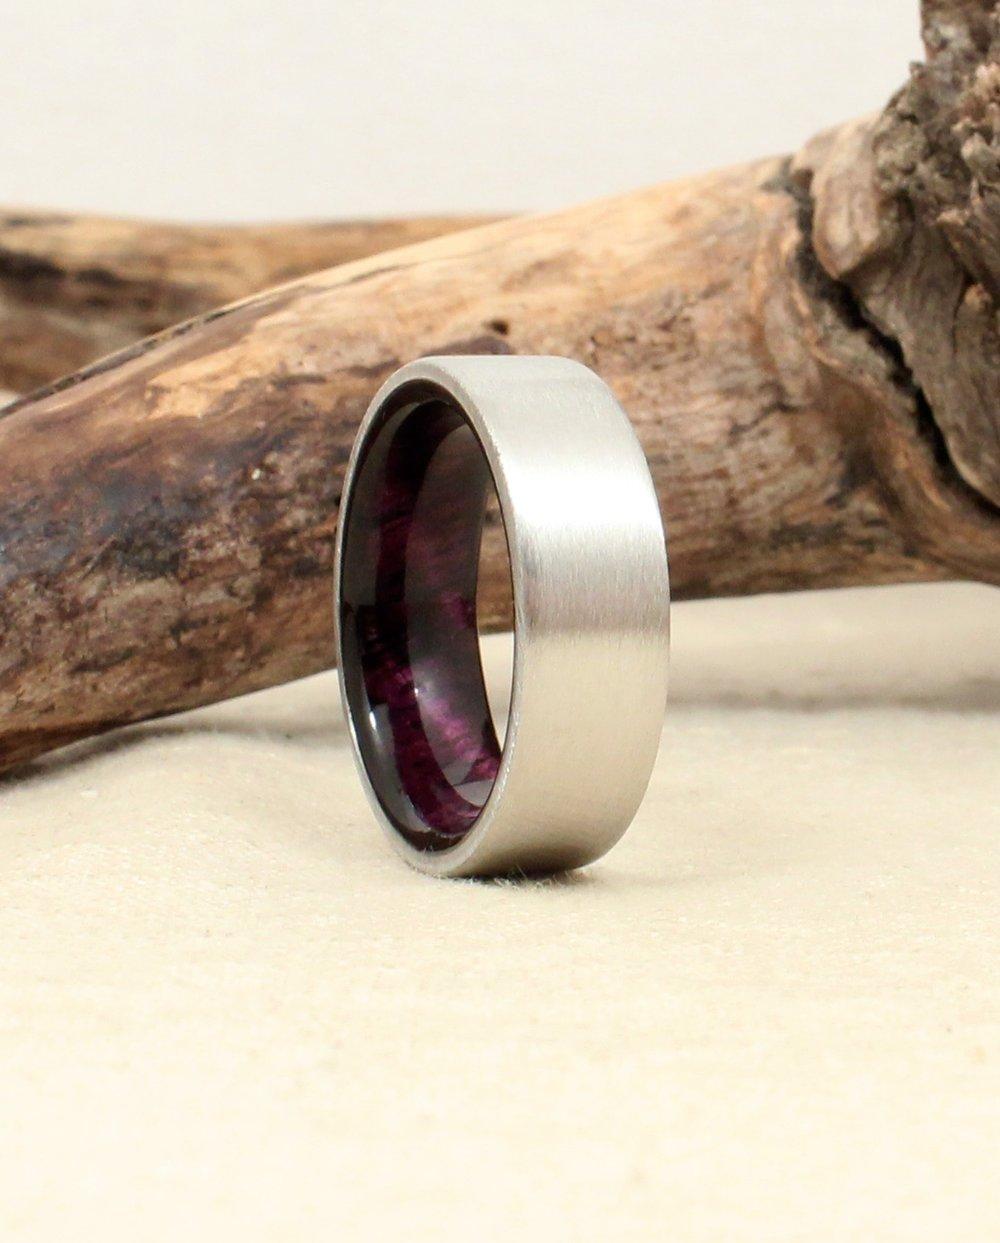 koa-wooden-ring-purple-wedgewood-cobalt.JPG